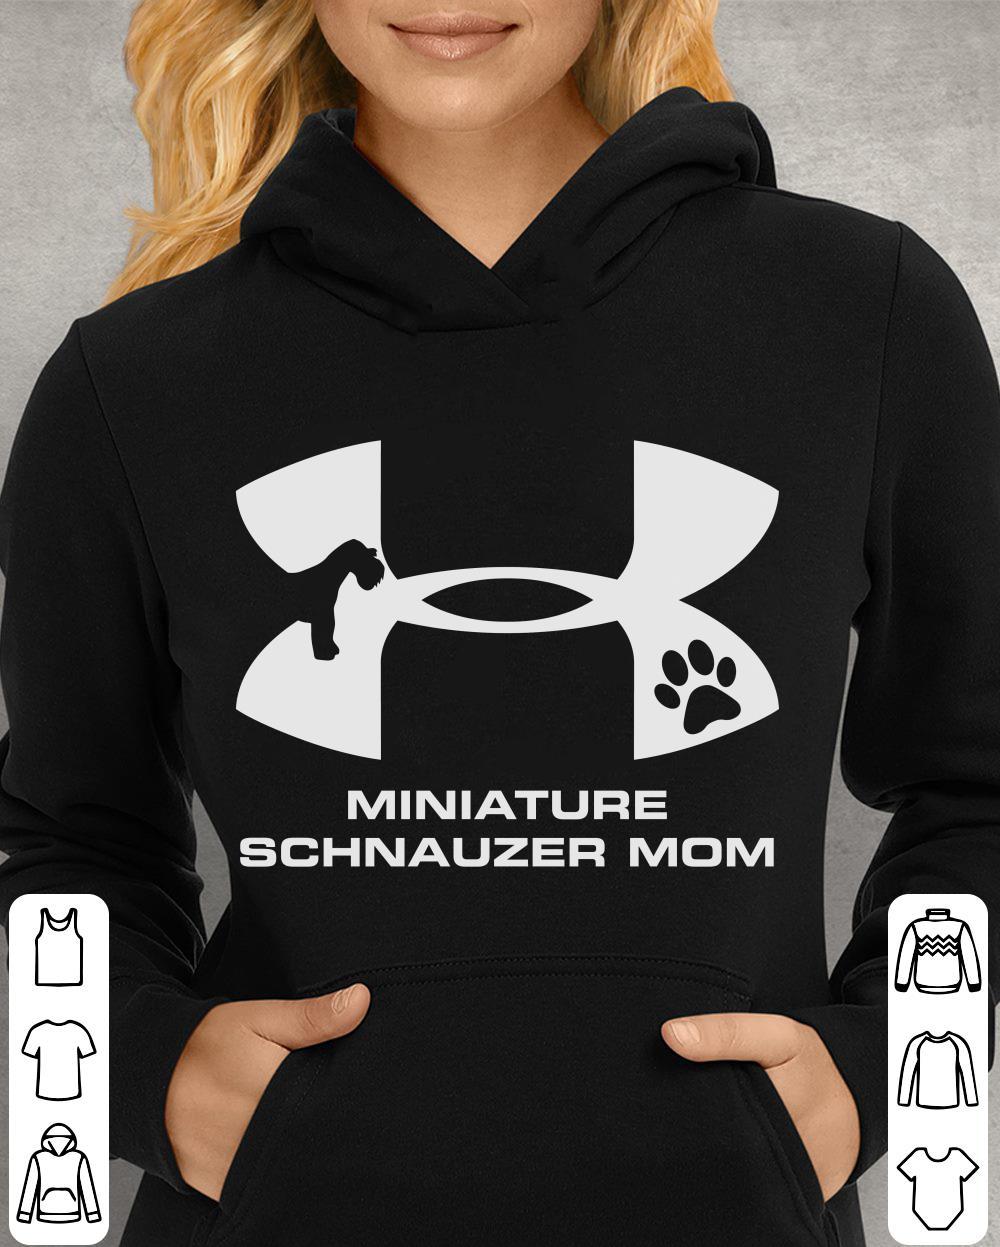 https://unicornshirts.net/images/2018/11/Under-Armour-Miniature-Schnauzer-Mom-shirt_4.jpg